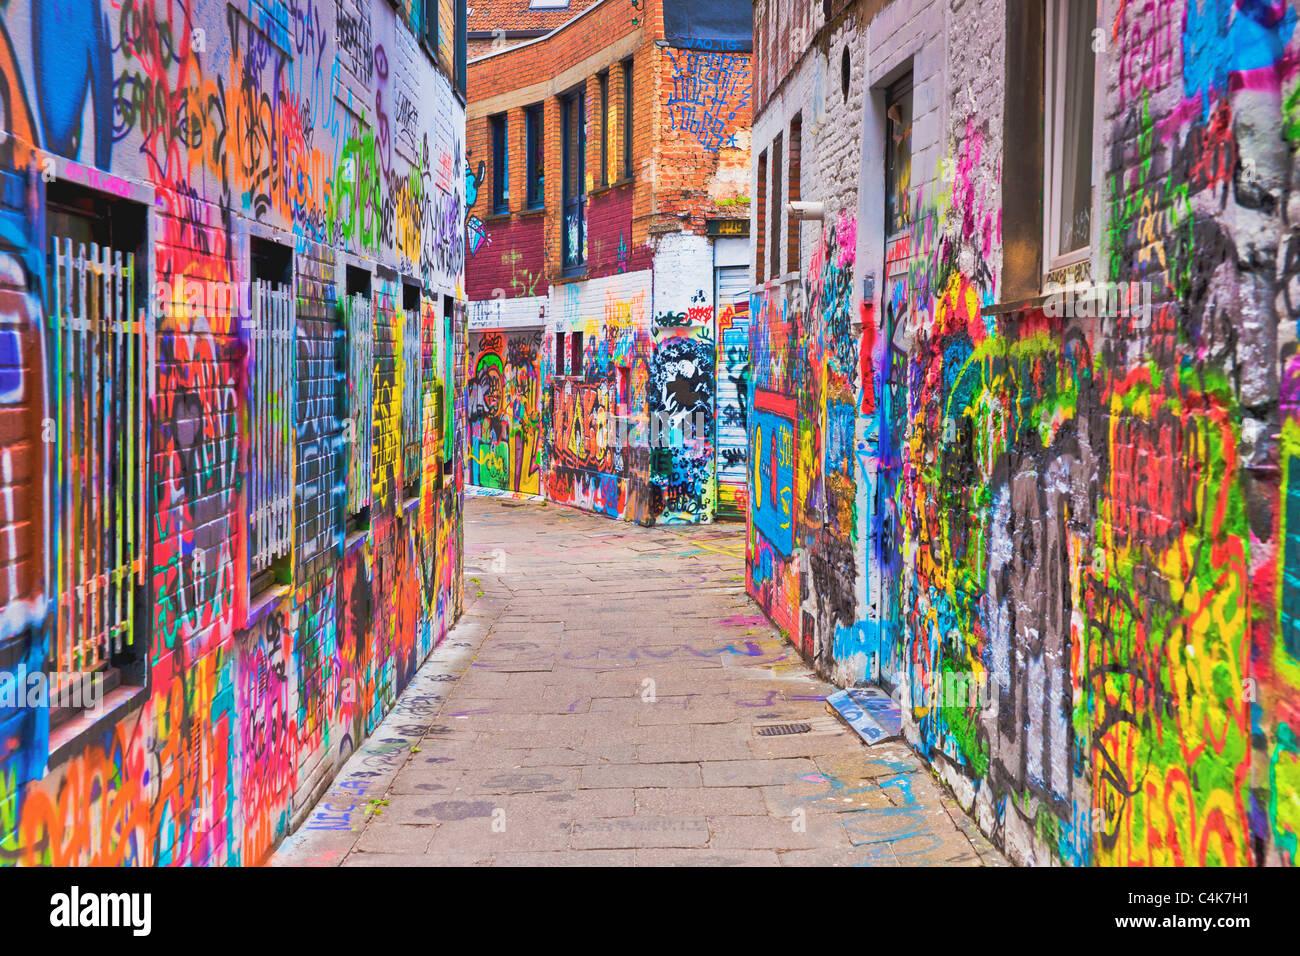 Graffitistrasse, Gent | graffiti street, Ghent - Stock Image